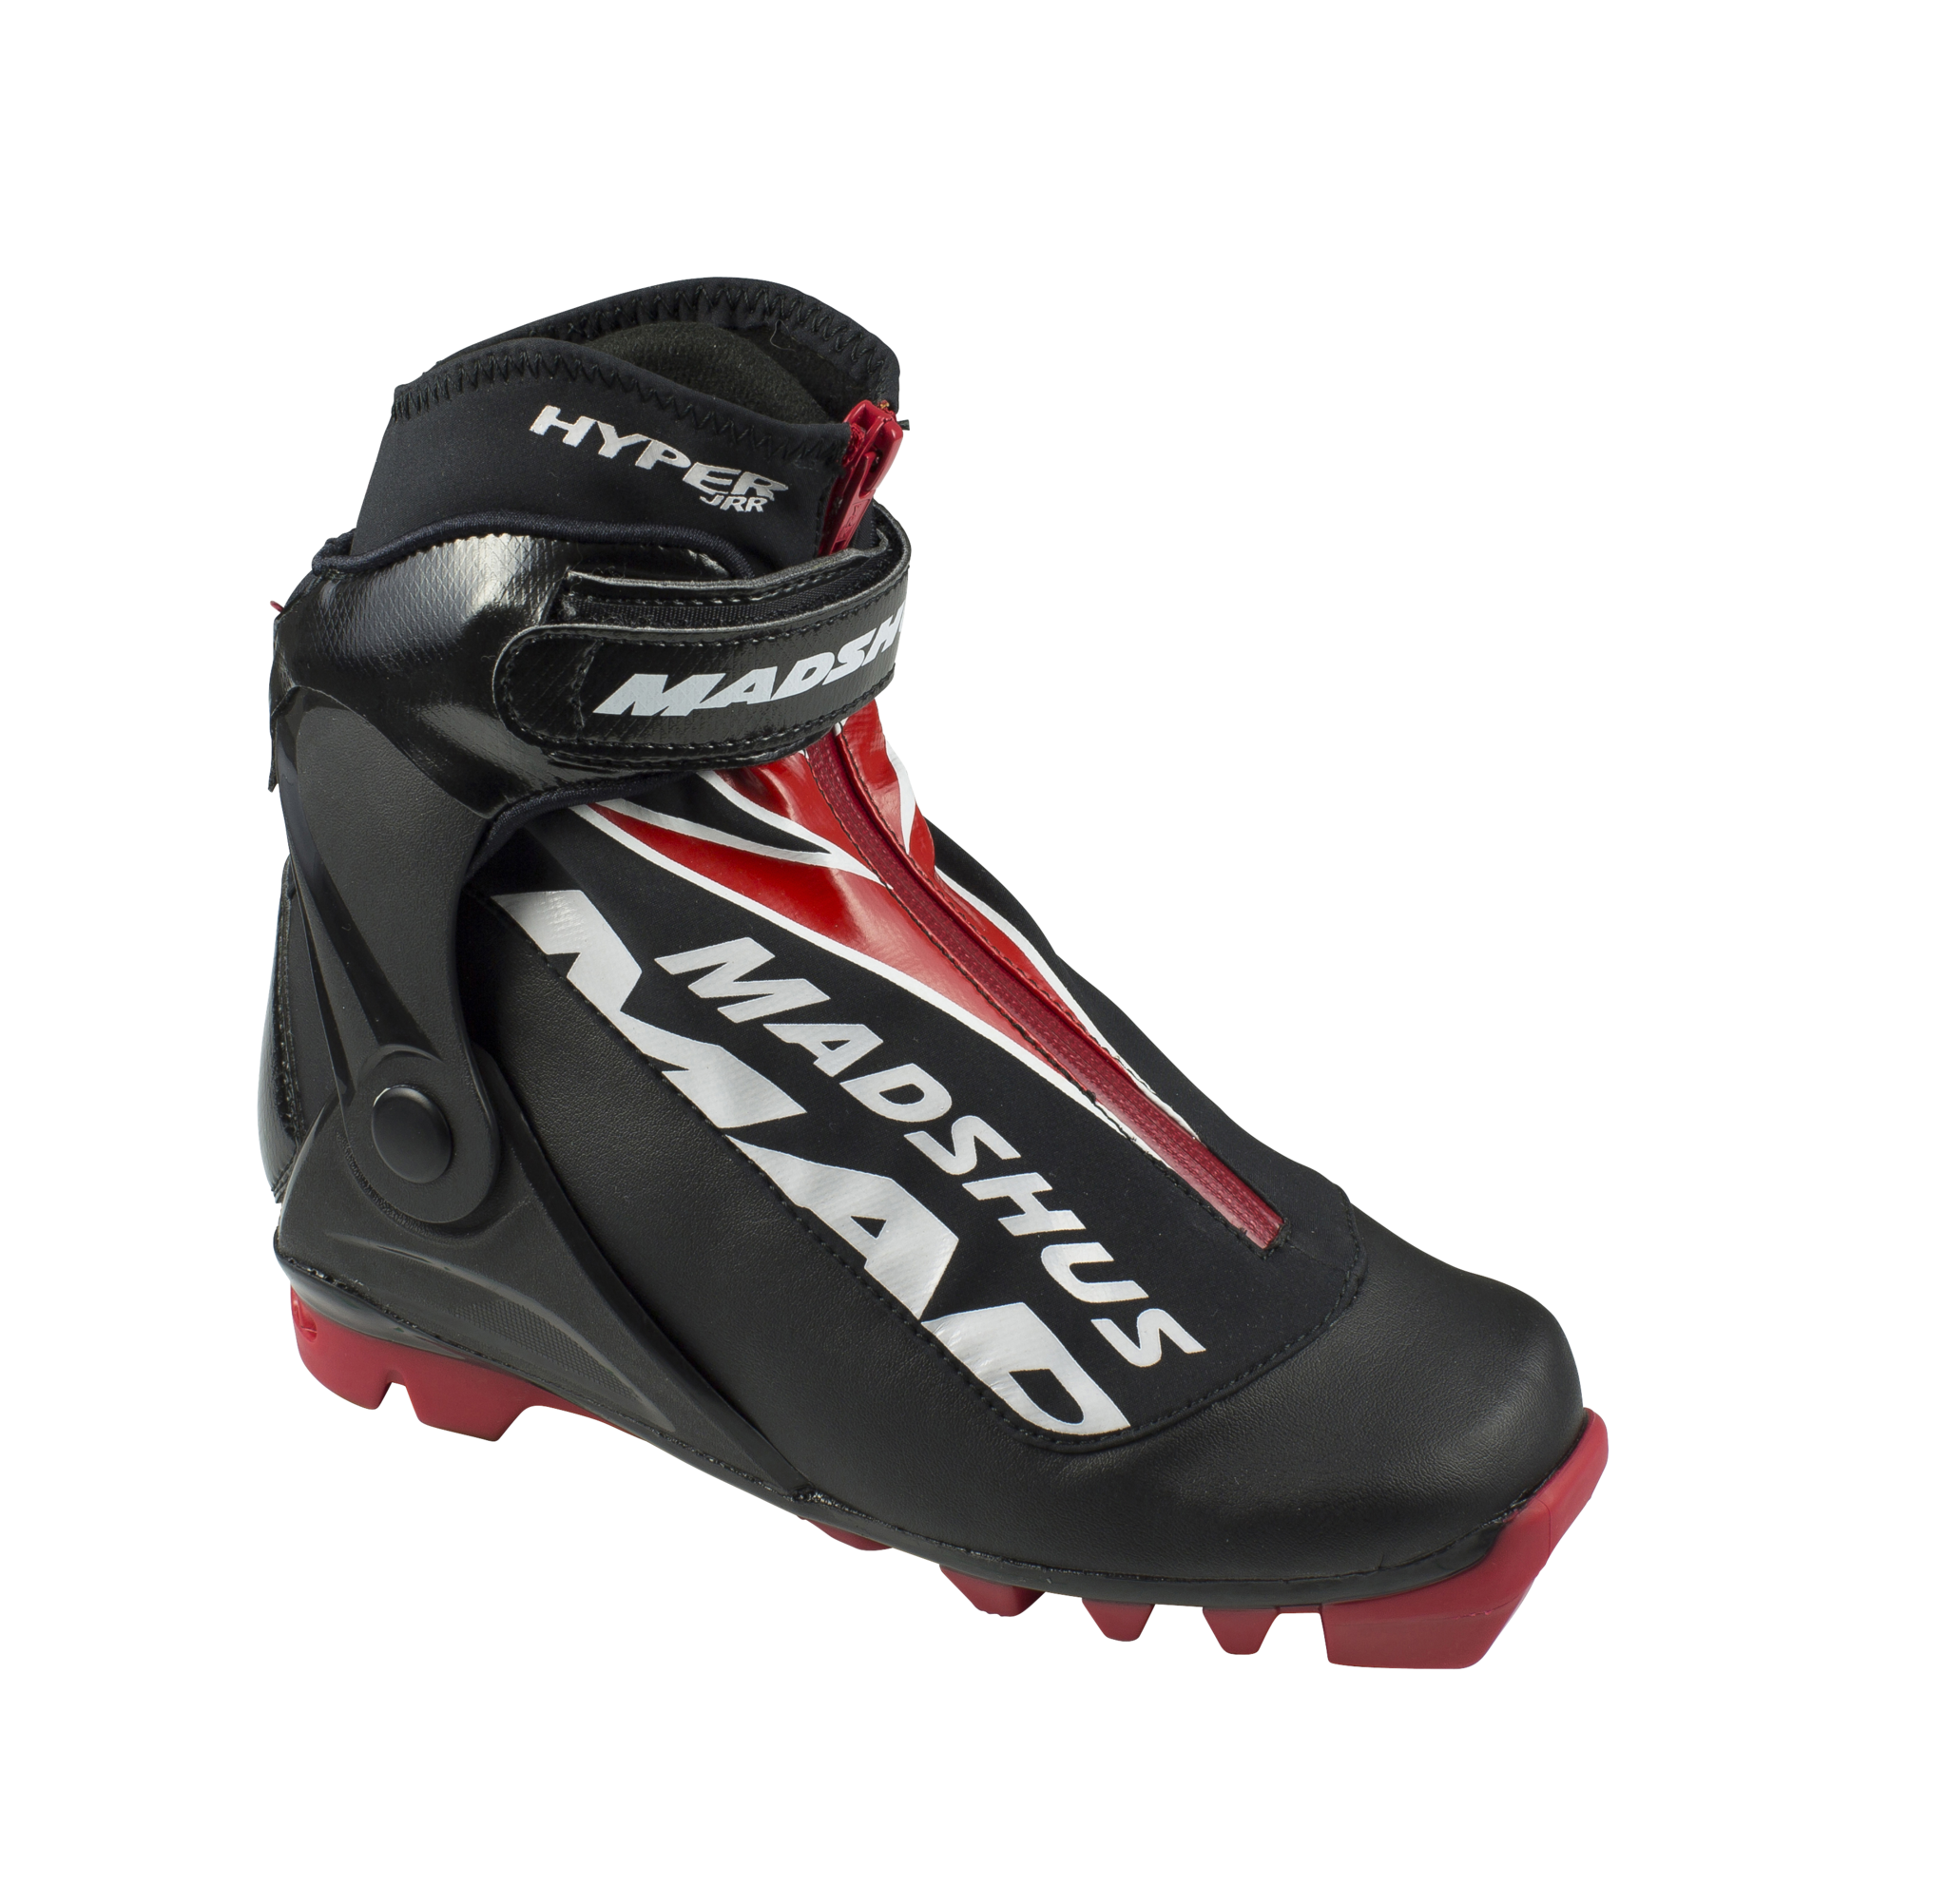 Ботинки лыжные Madshus Hyper JRR